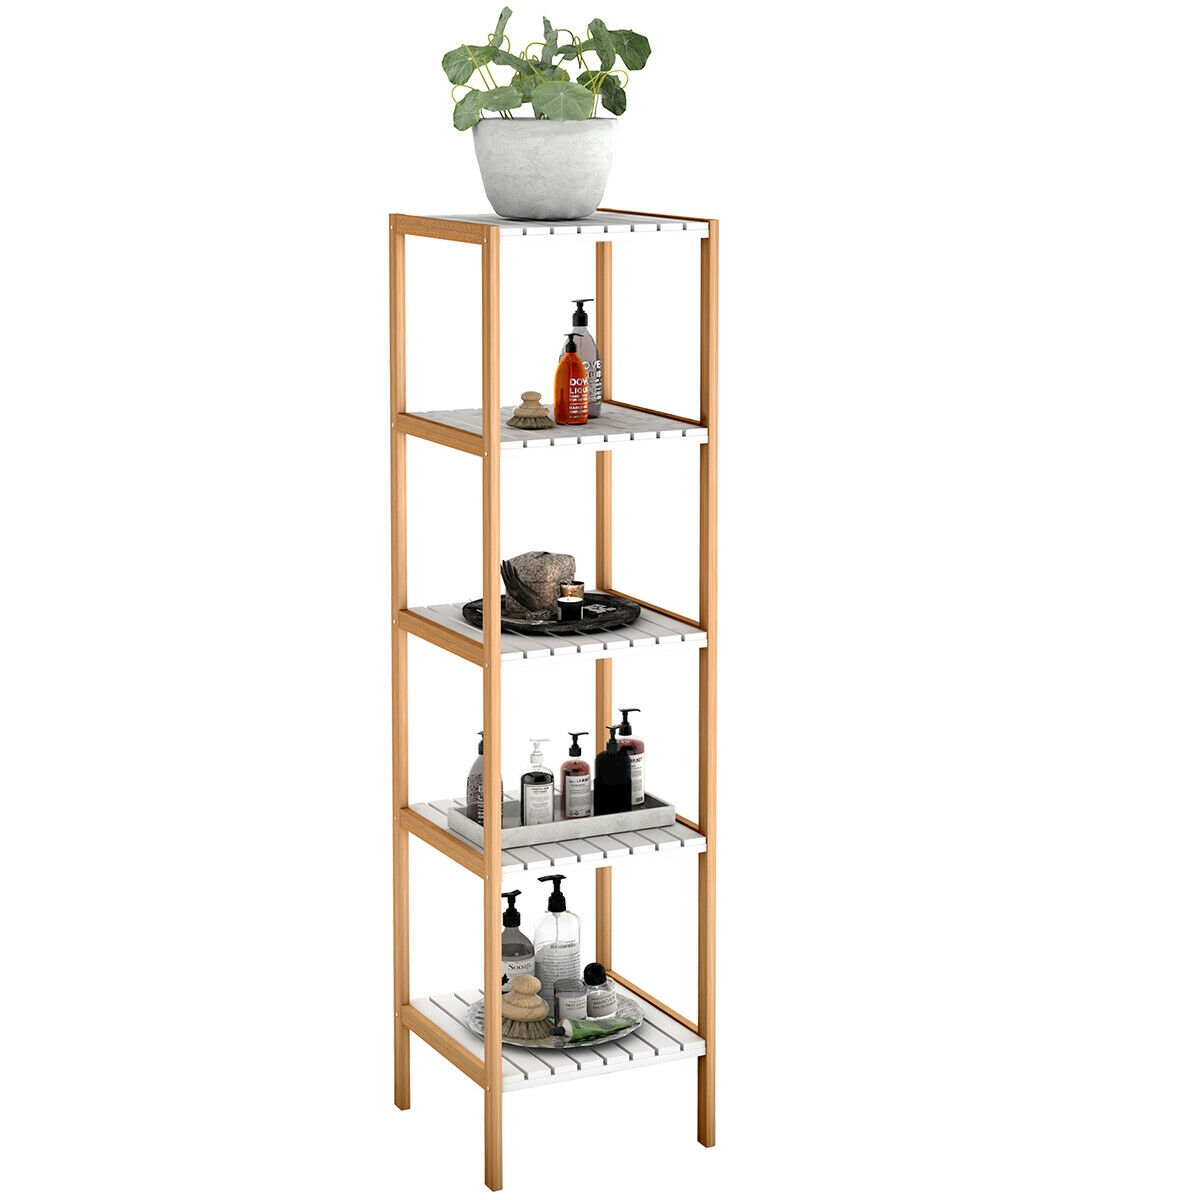 5-Tier Bamboo Utility Shelves Domestic Storage Freestanding Units Shelf